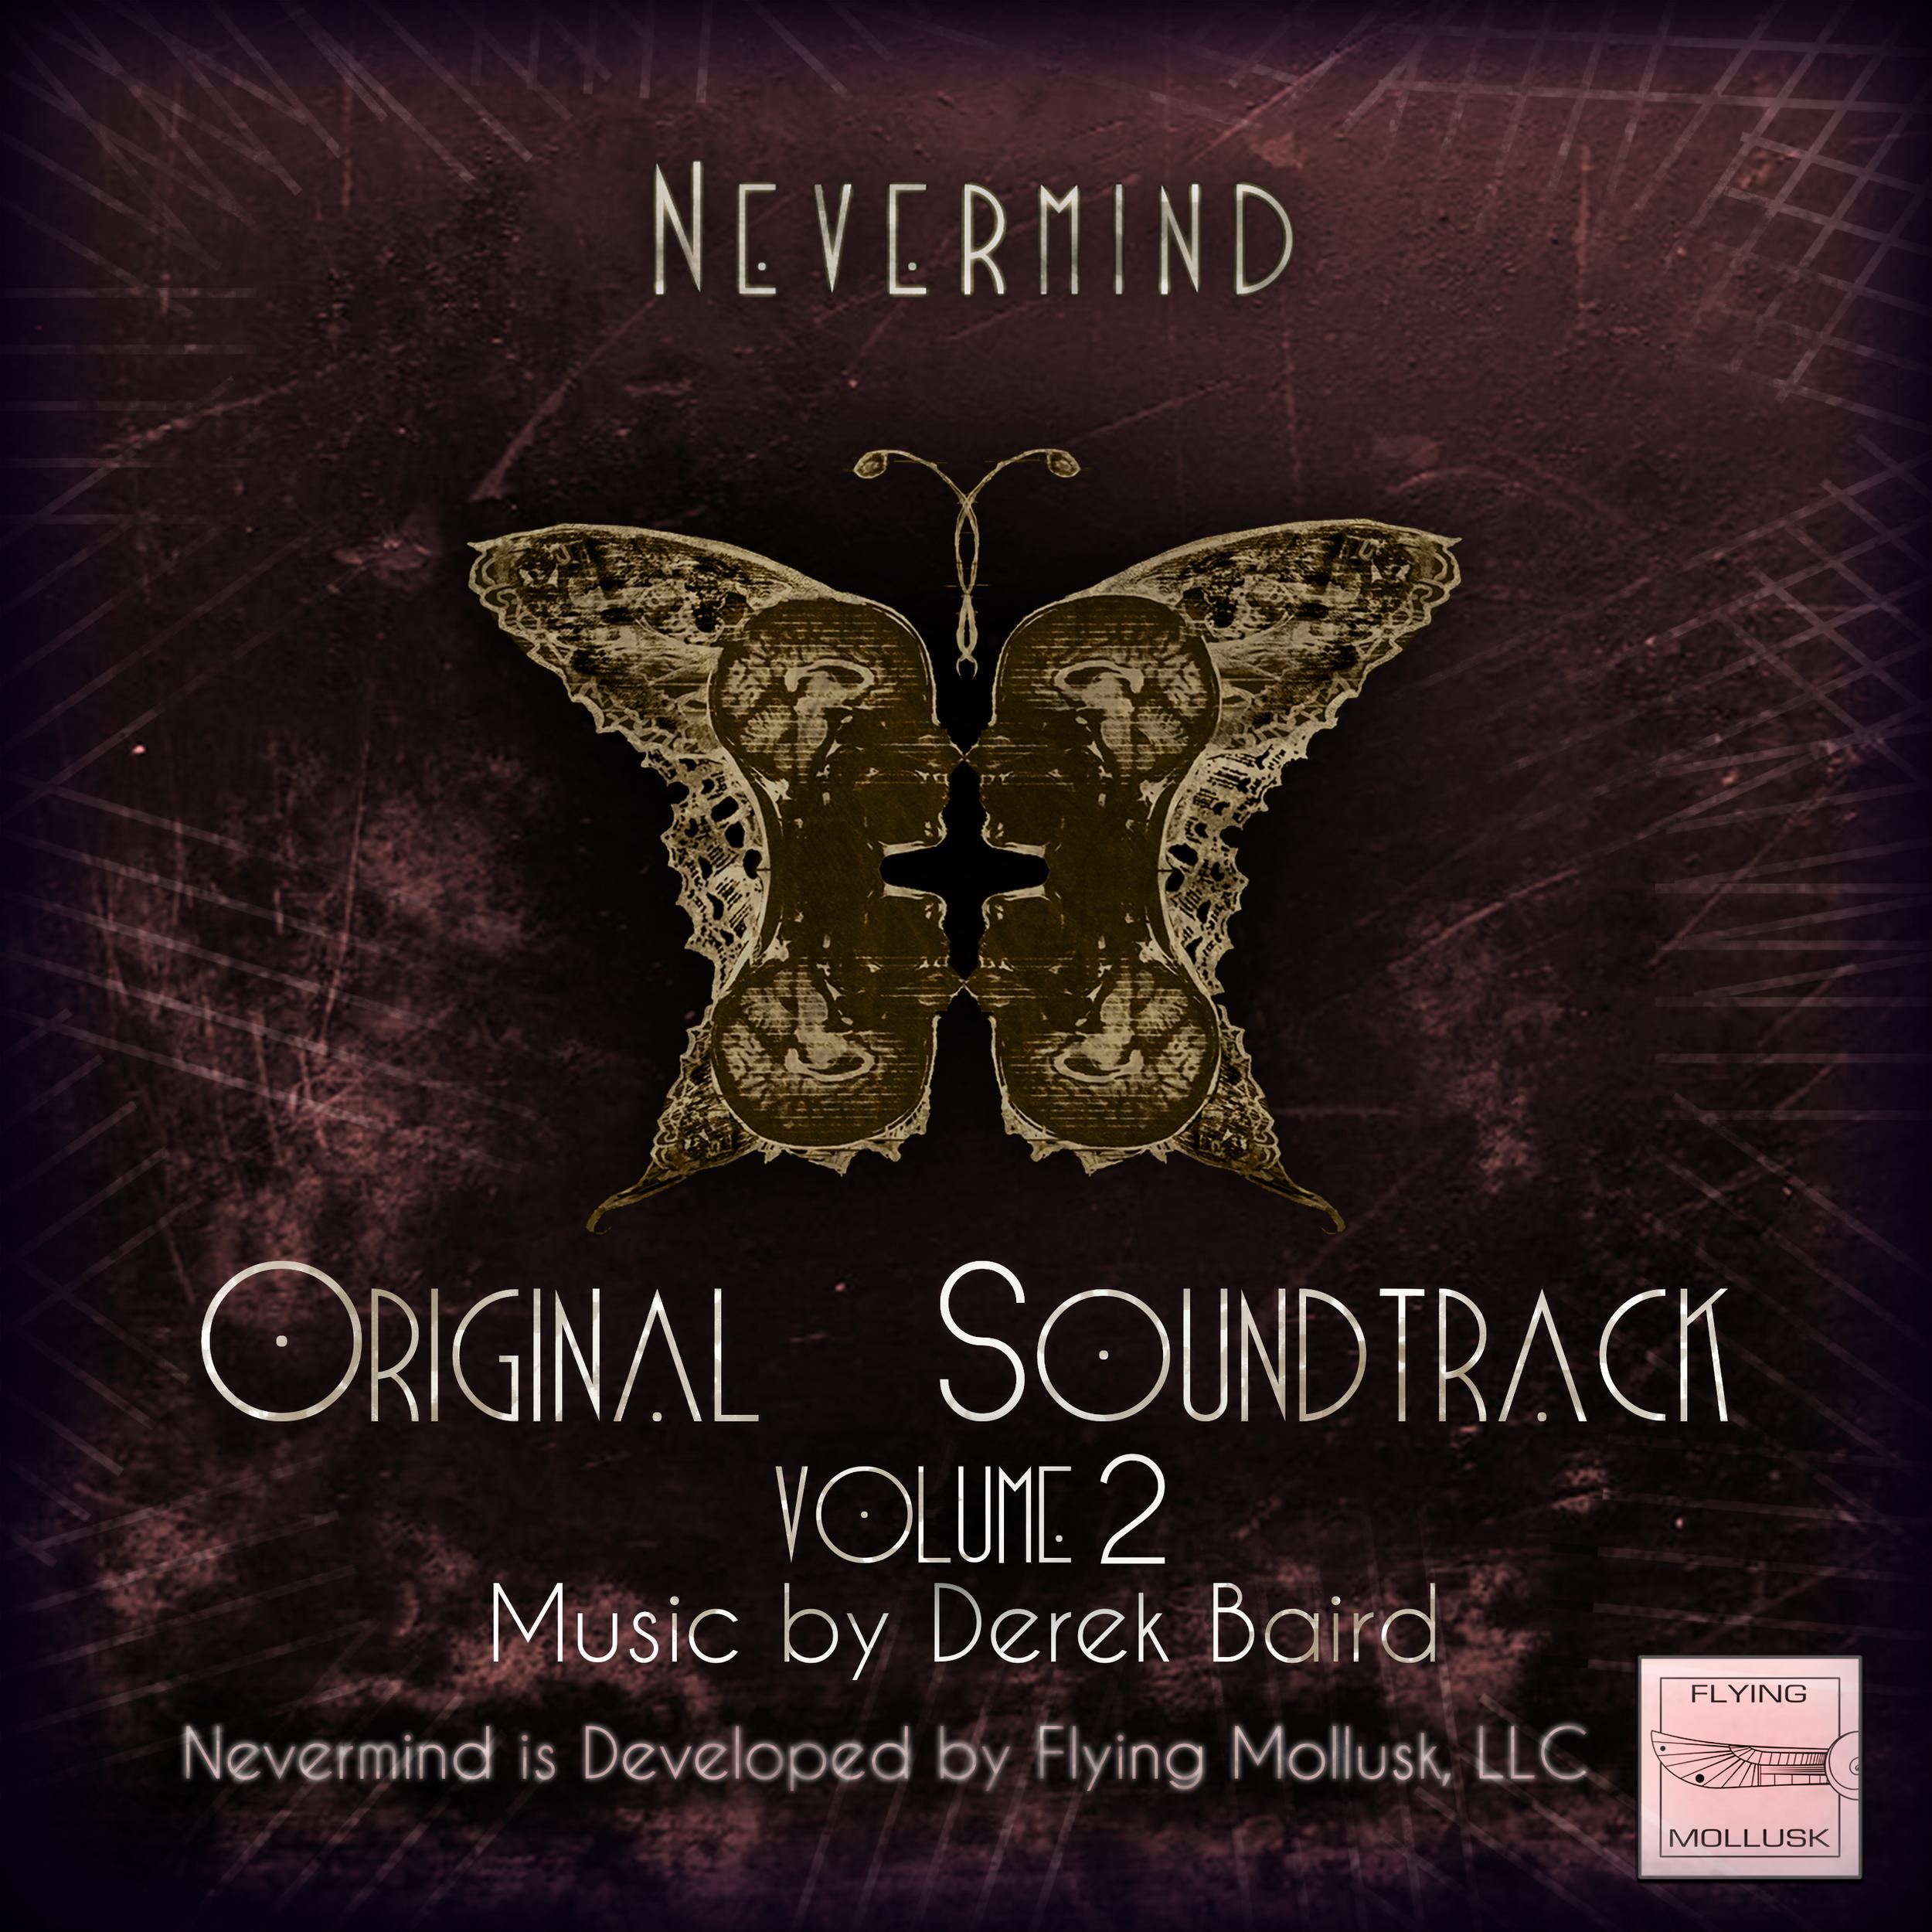 NevermindOriginalSoundtrack_Vol2_MusicByDerekBaird.png